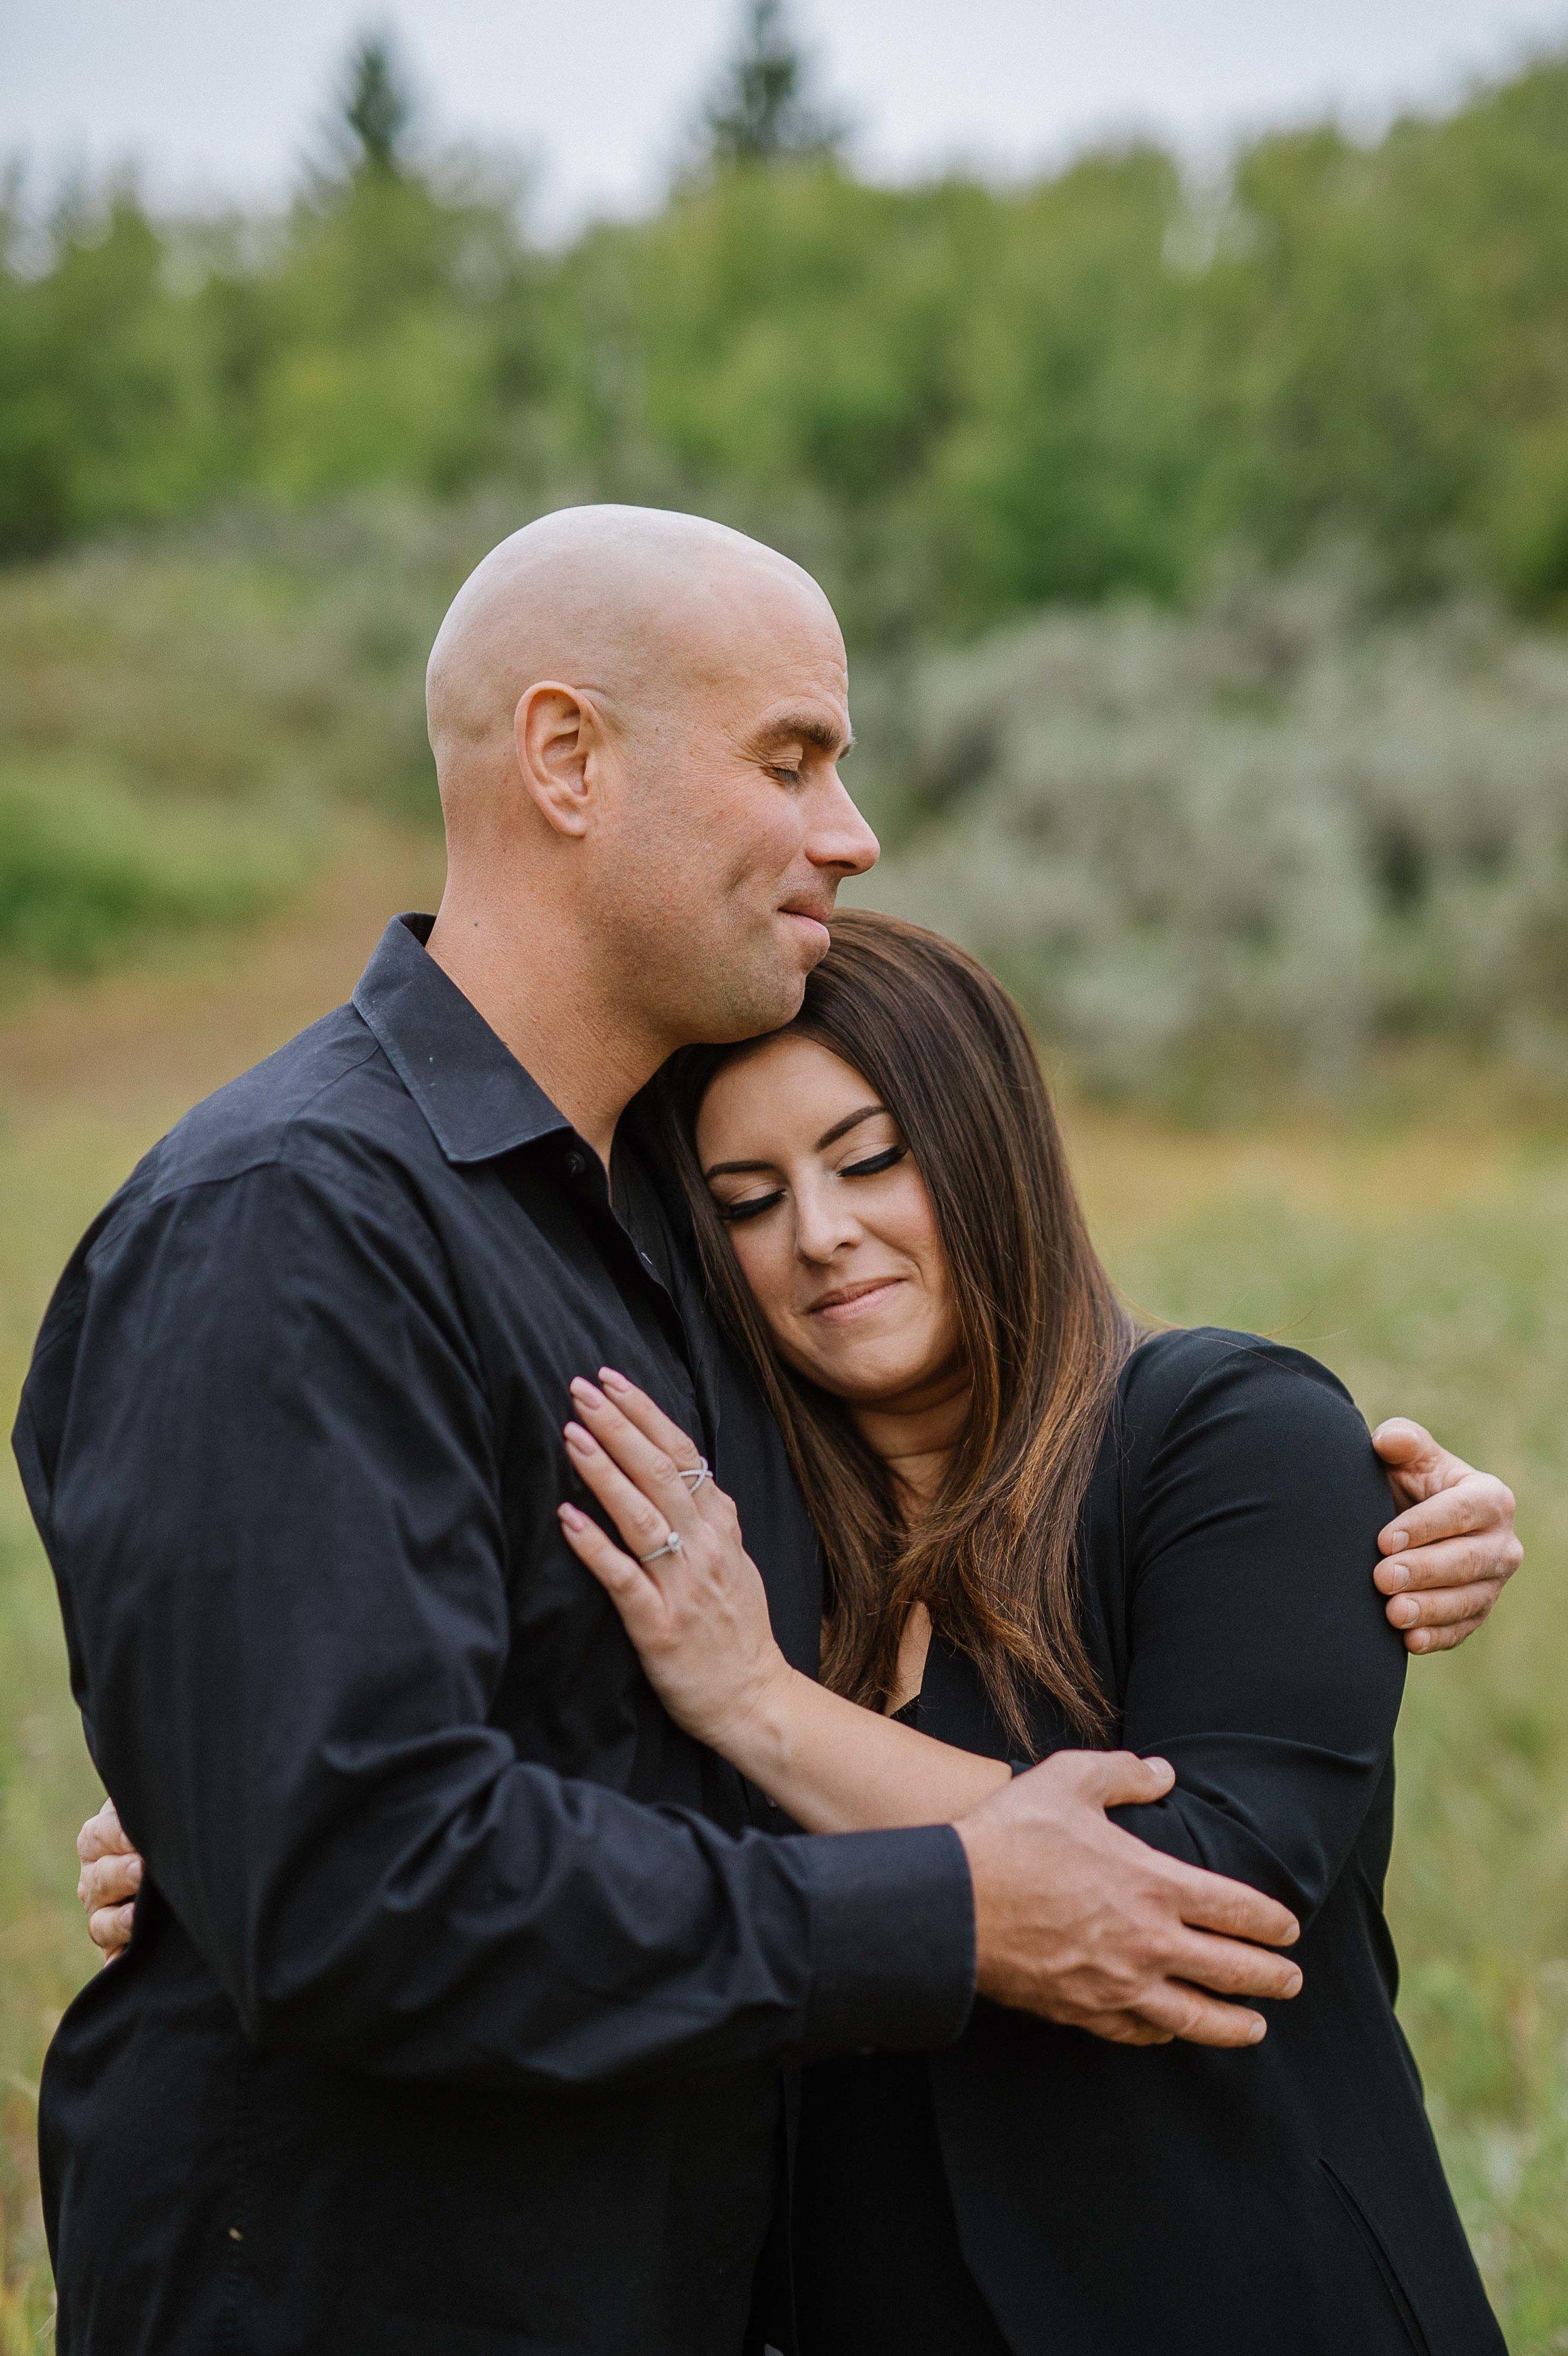 Christy-D-Swanberg-Photography-Calgary-Engagements-15.jpg